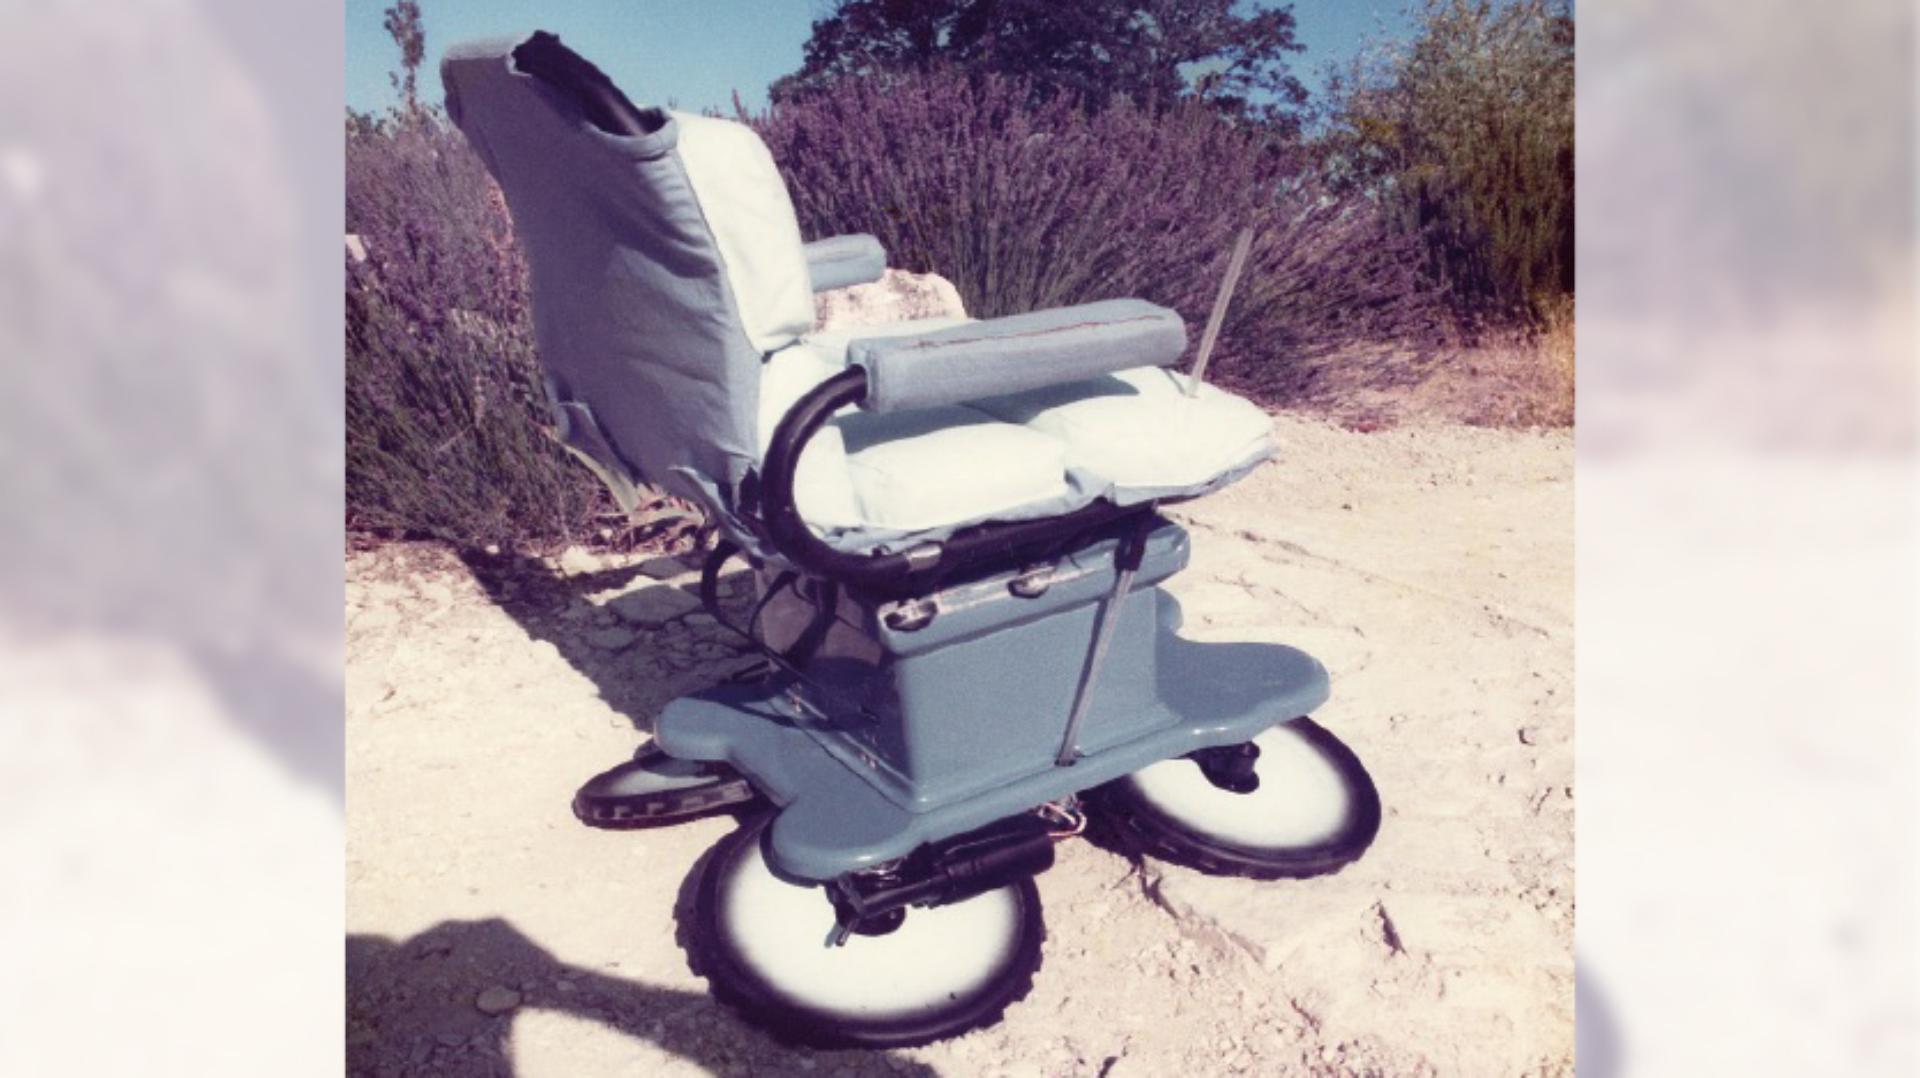 A large wheeled wheelchair